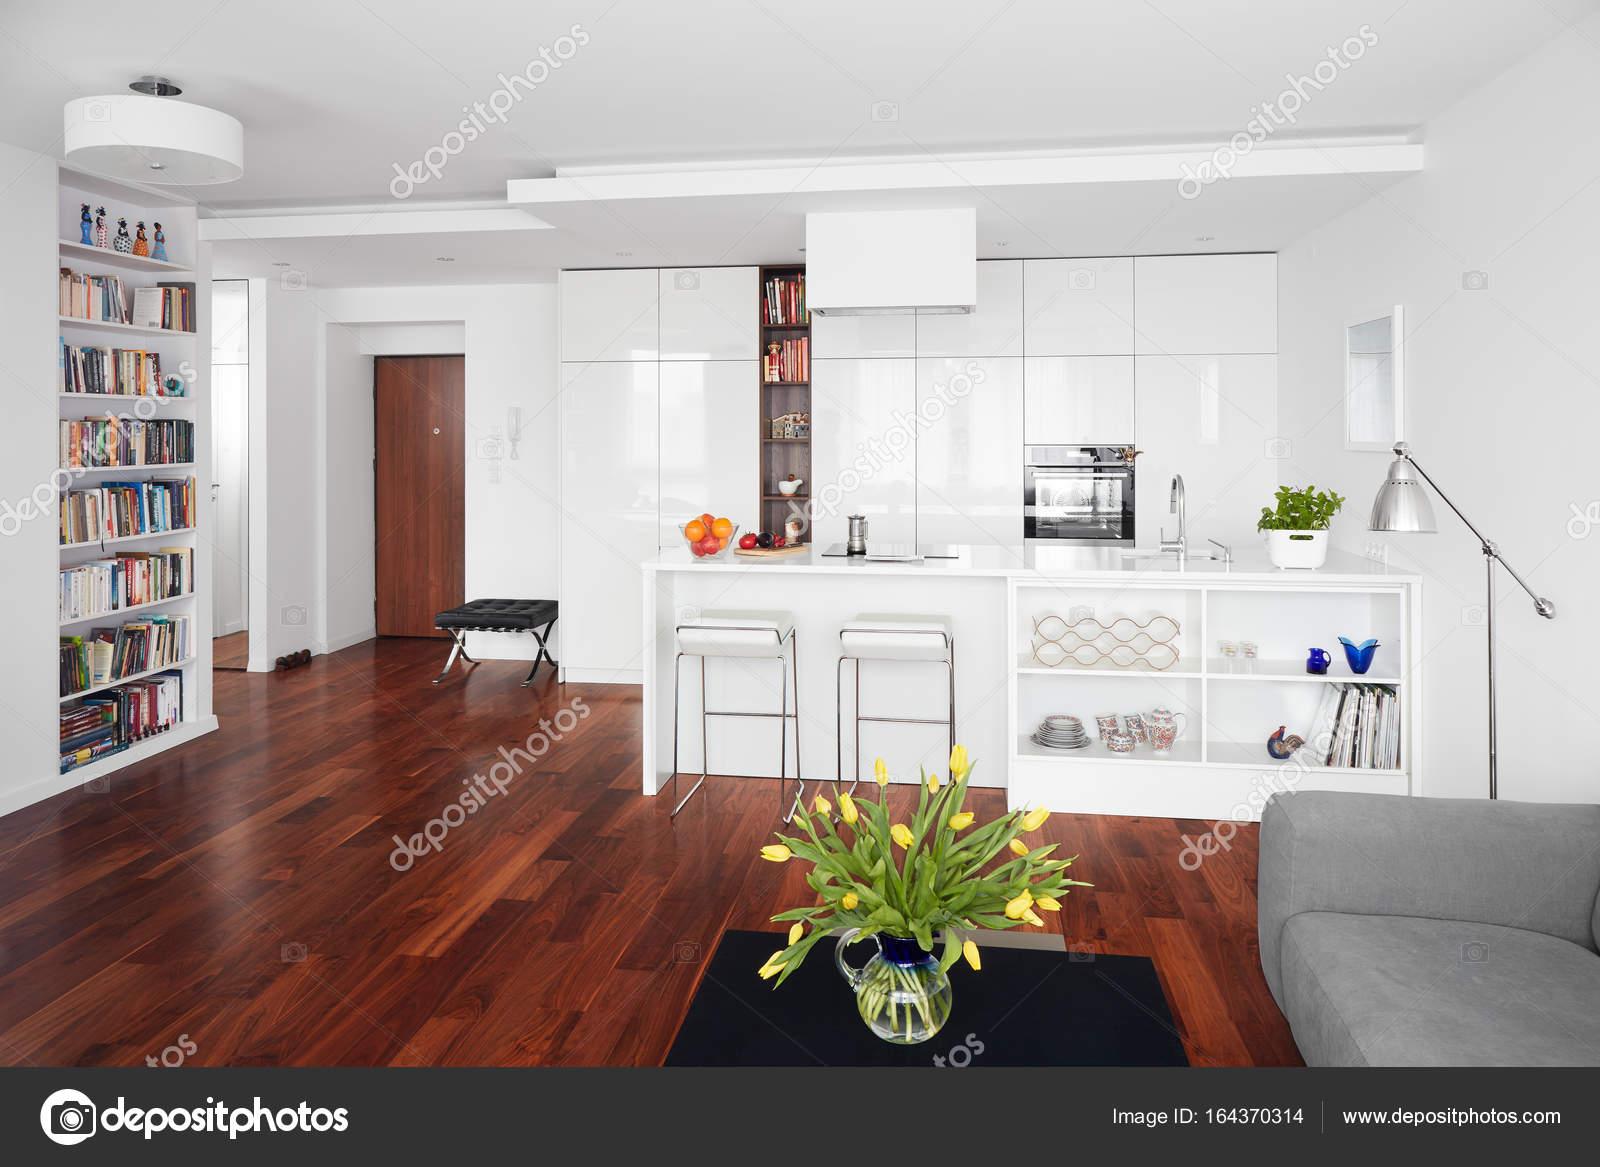 https://st3.depositphotos.com/2198934/16437/i/1600/depositphotos_164370314-stockafbeelding-moderne-keuken-en-woonkamer-scandinavische.jpg